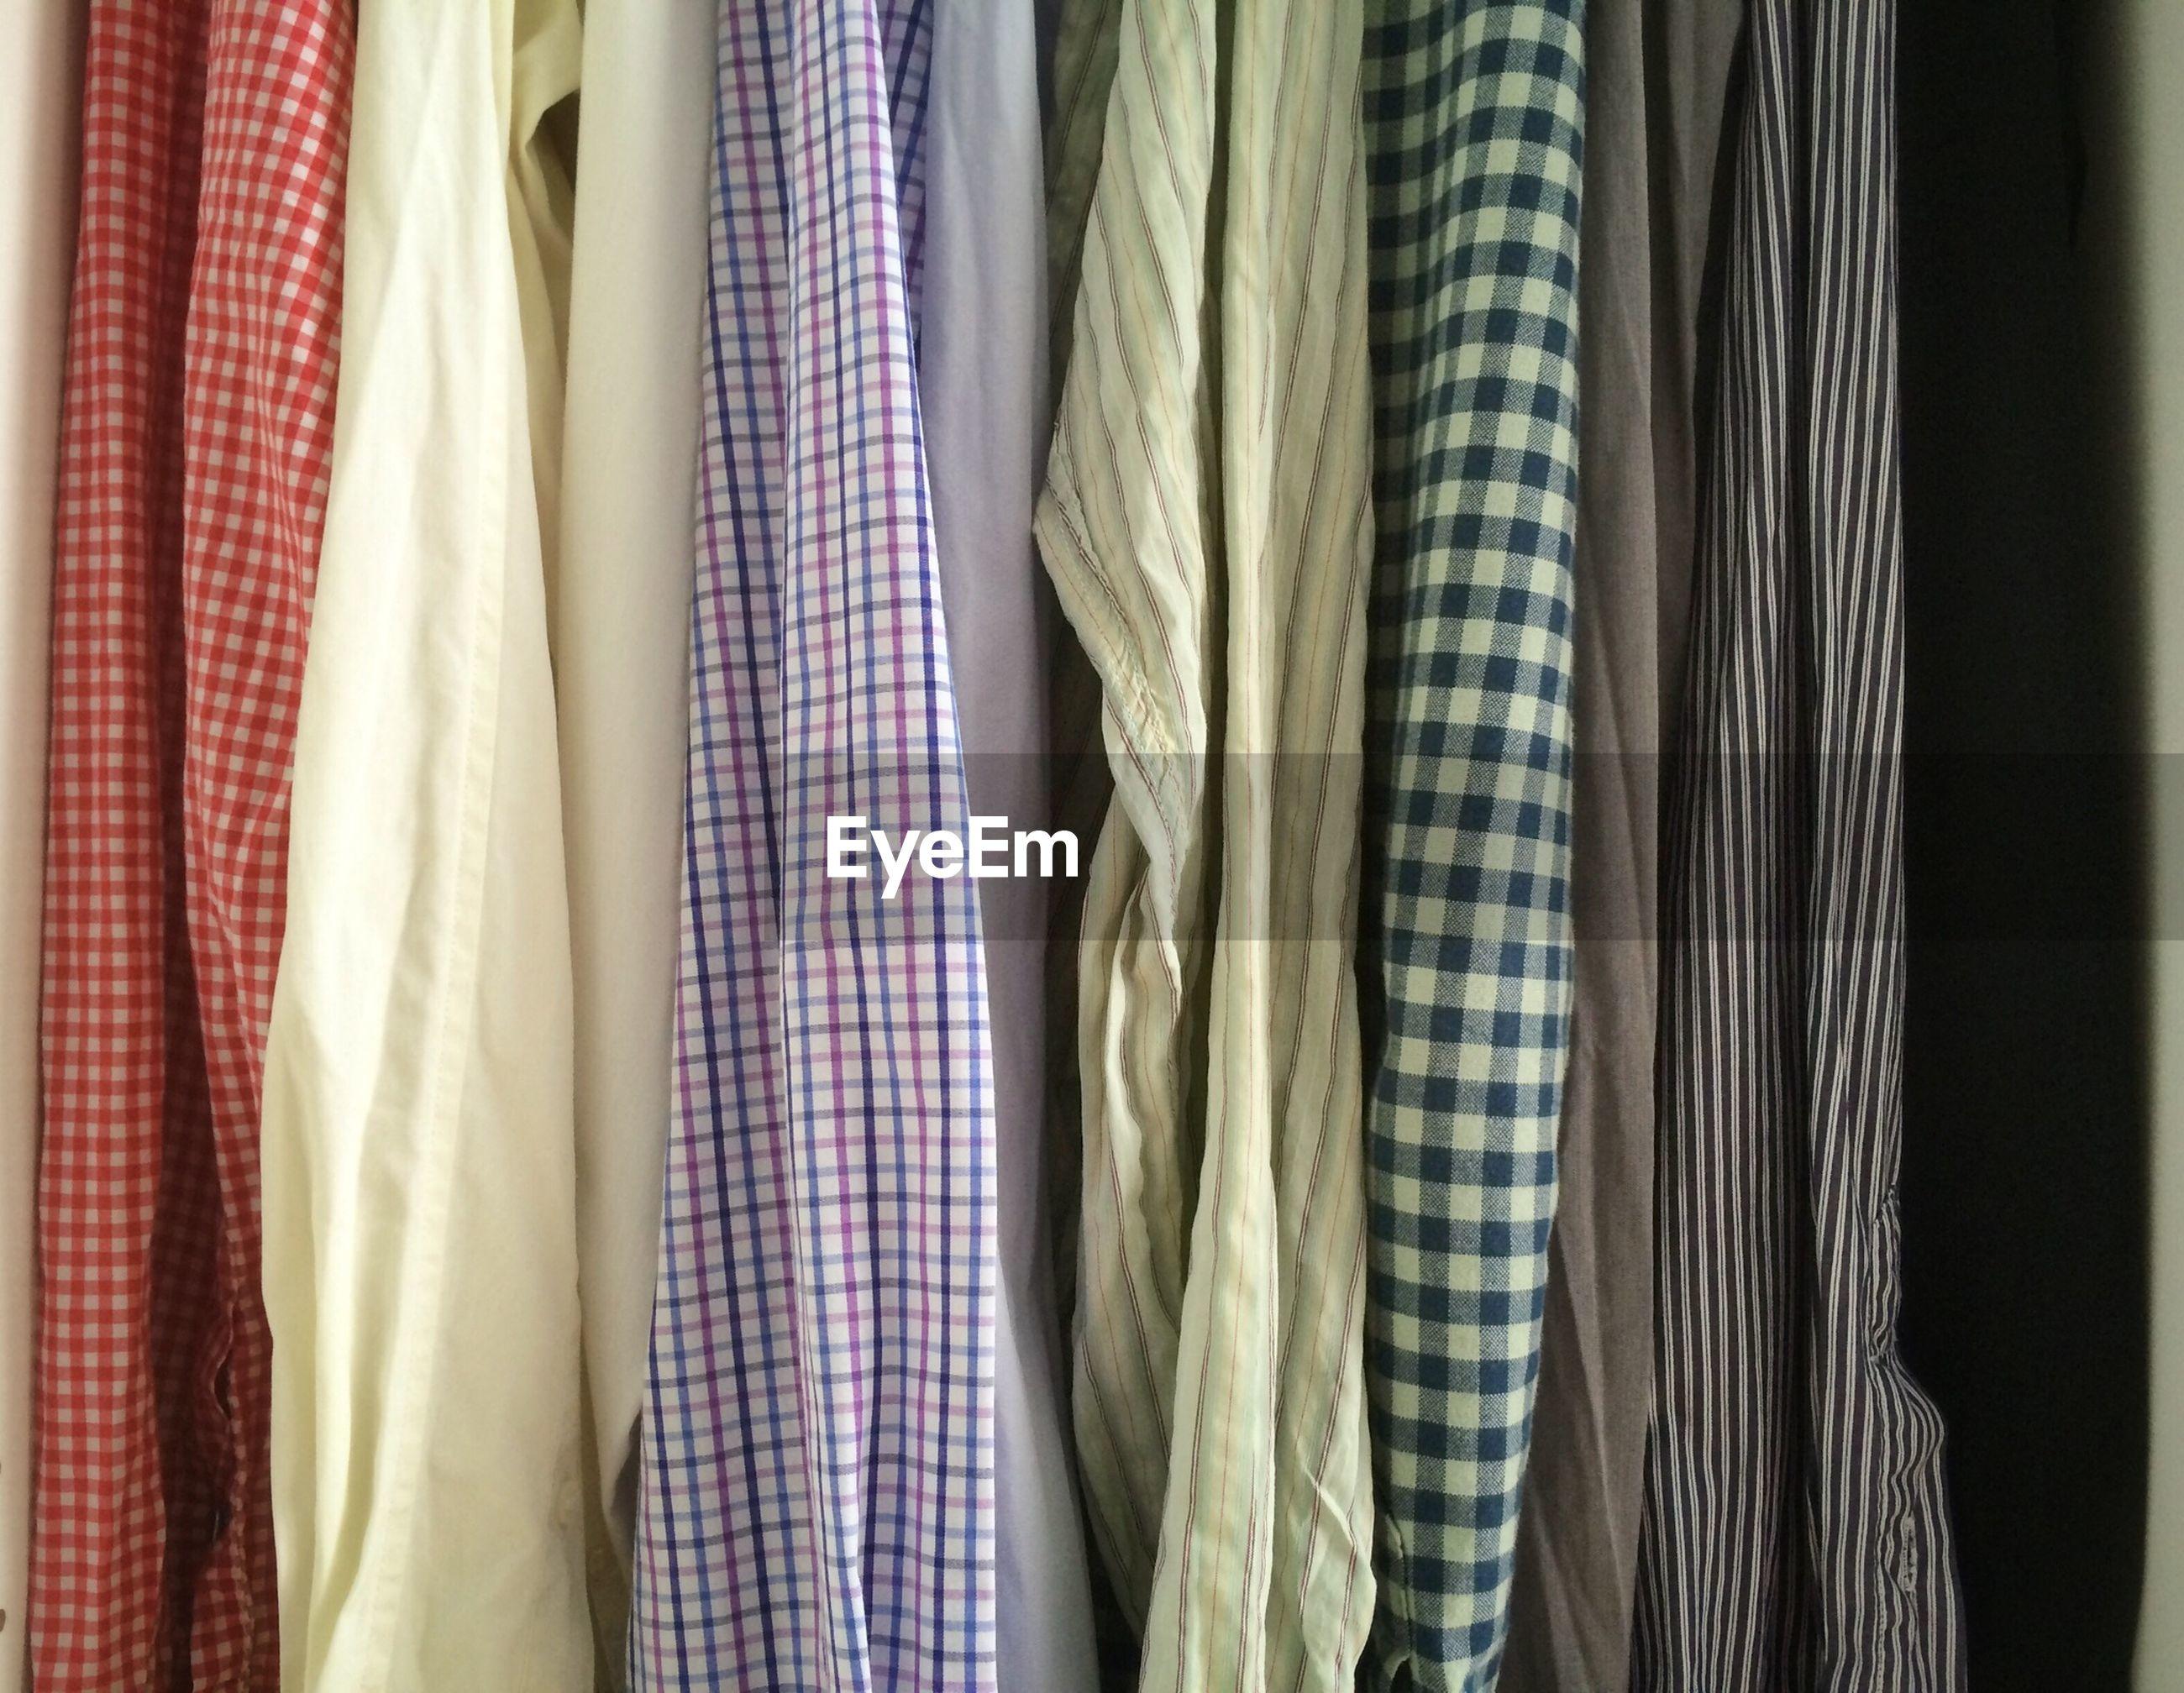 Close-up of shirts hanging in closet